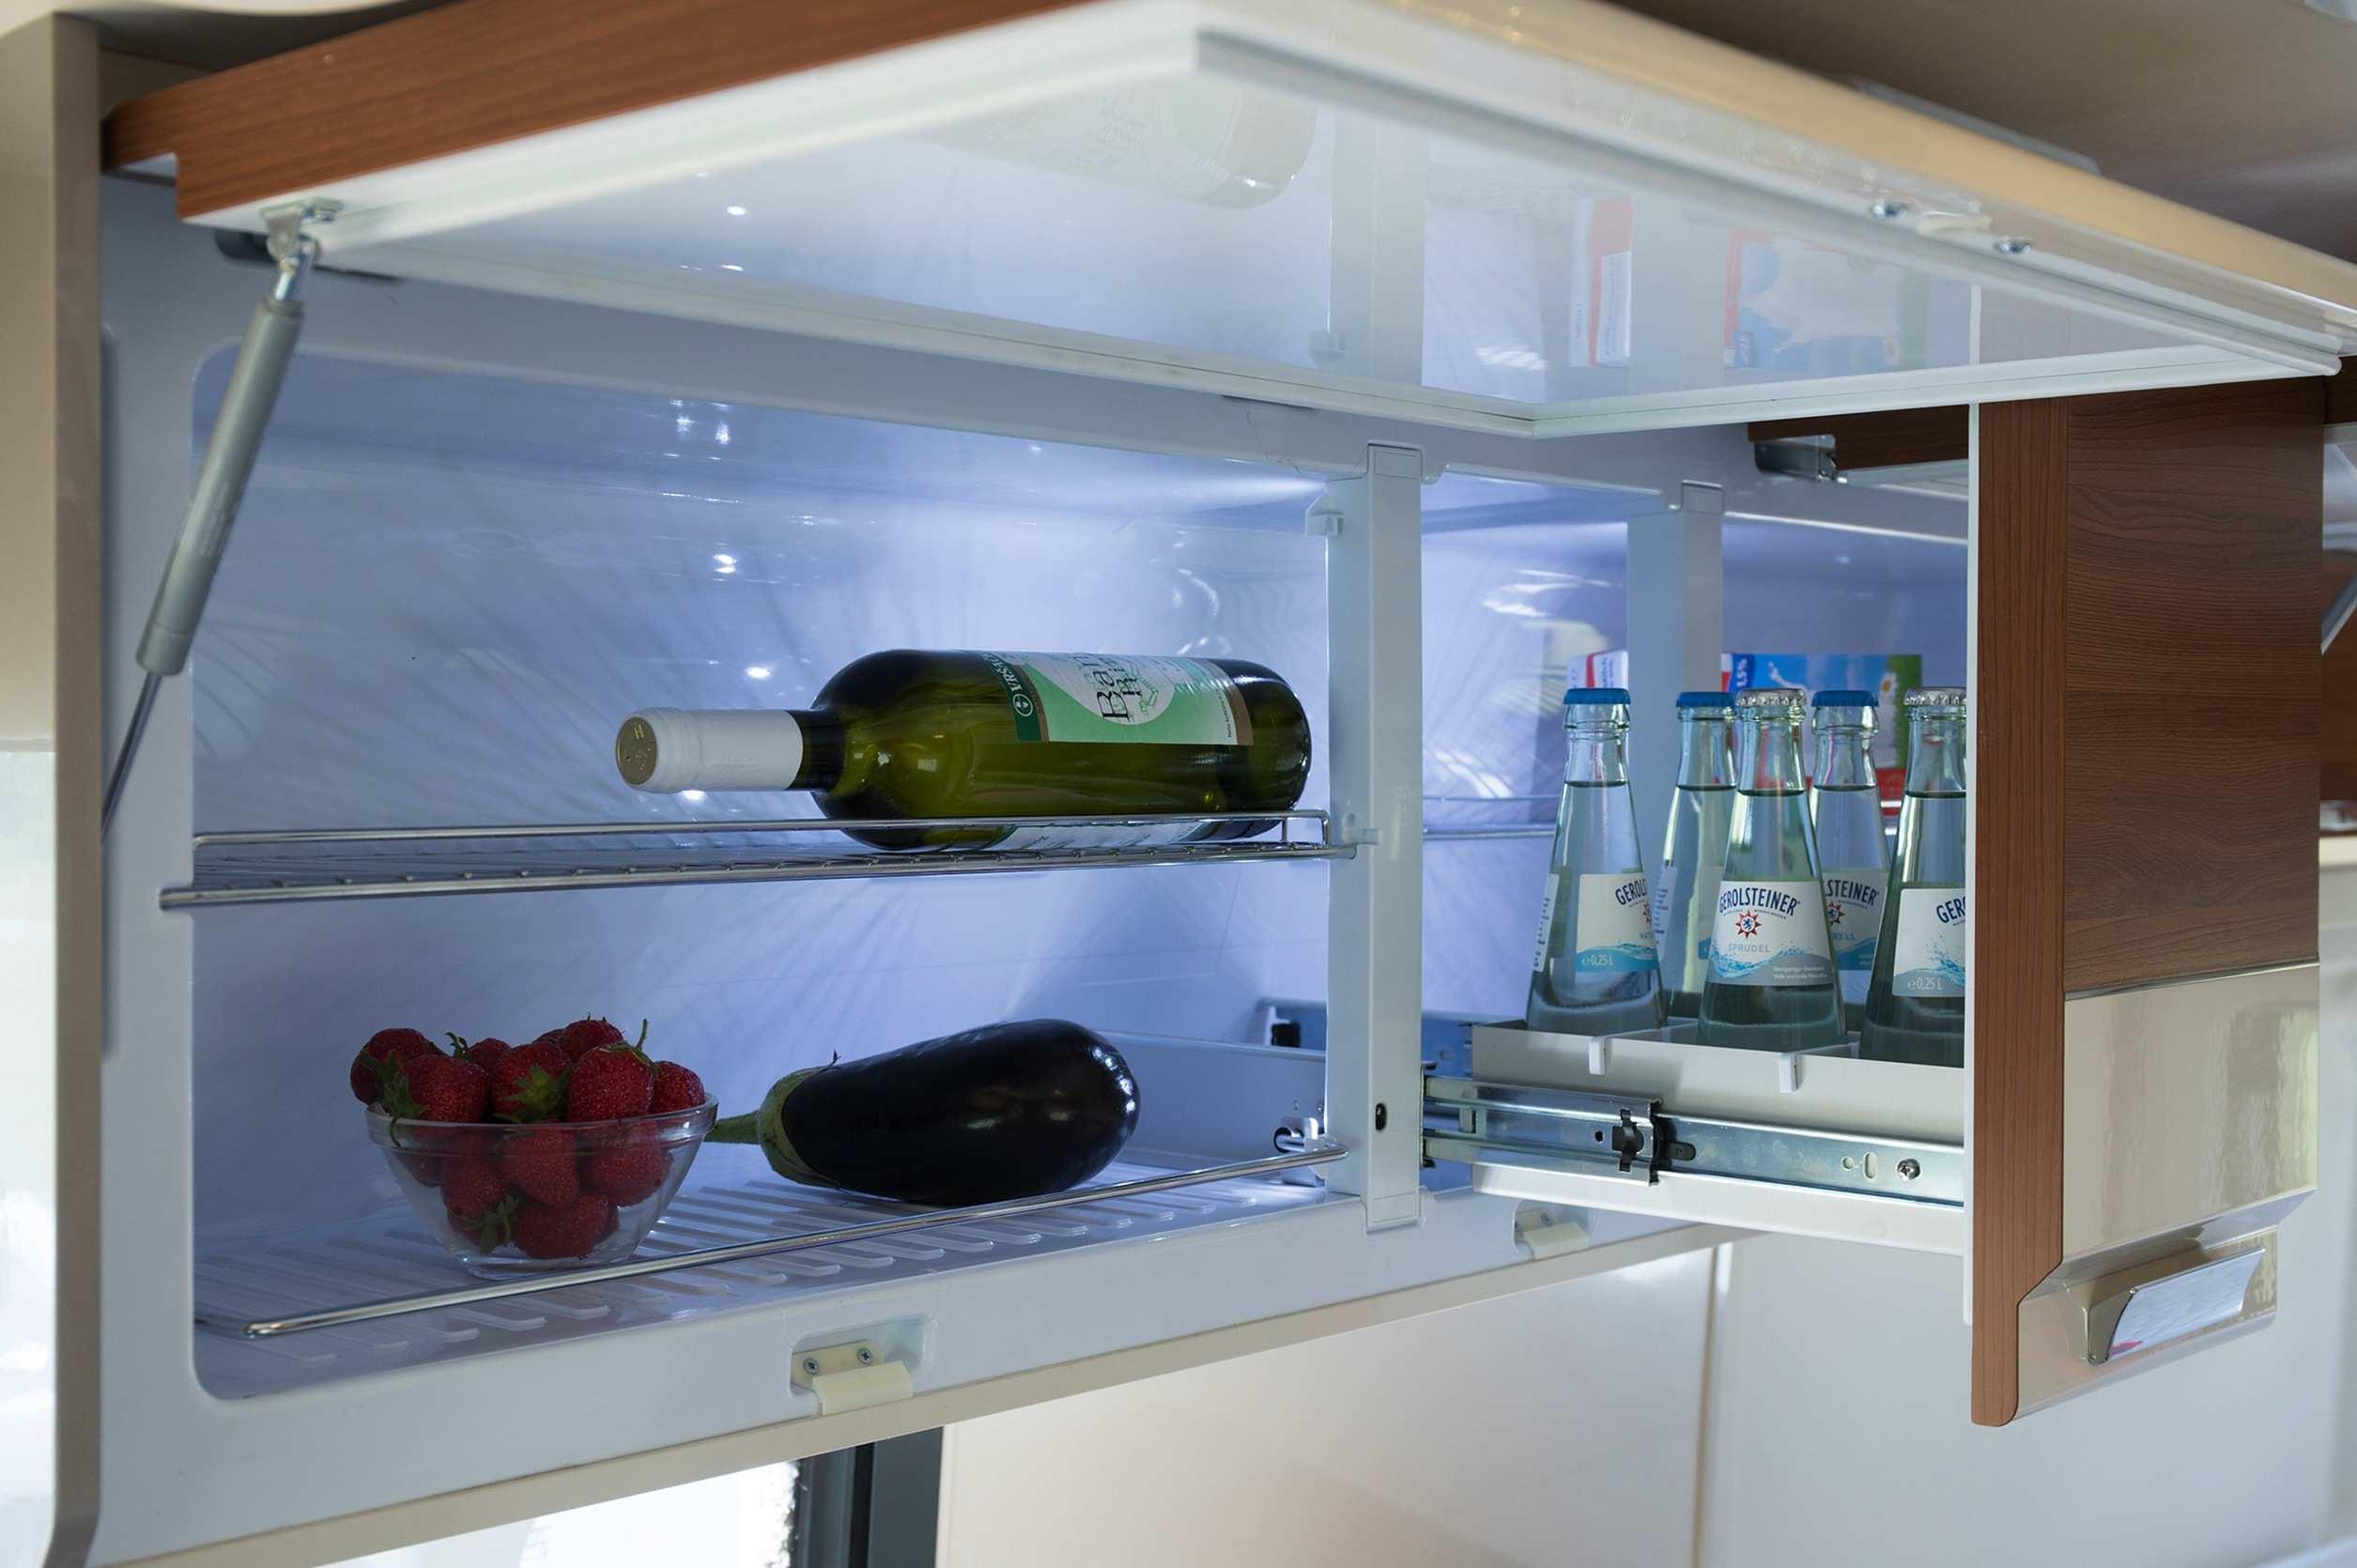 Reisemobil Hobby-Vantana mit einzigartigem Kühlschrank - Die ...